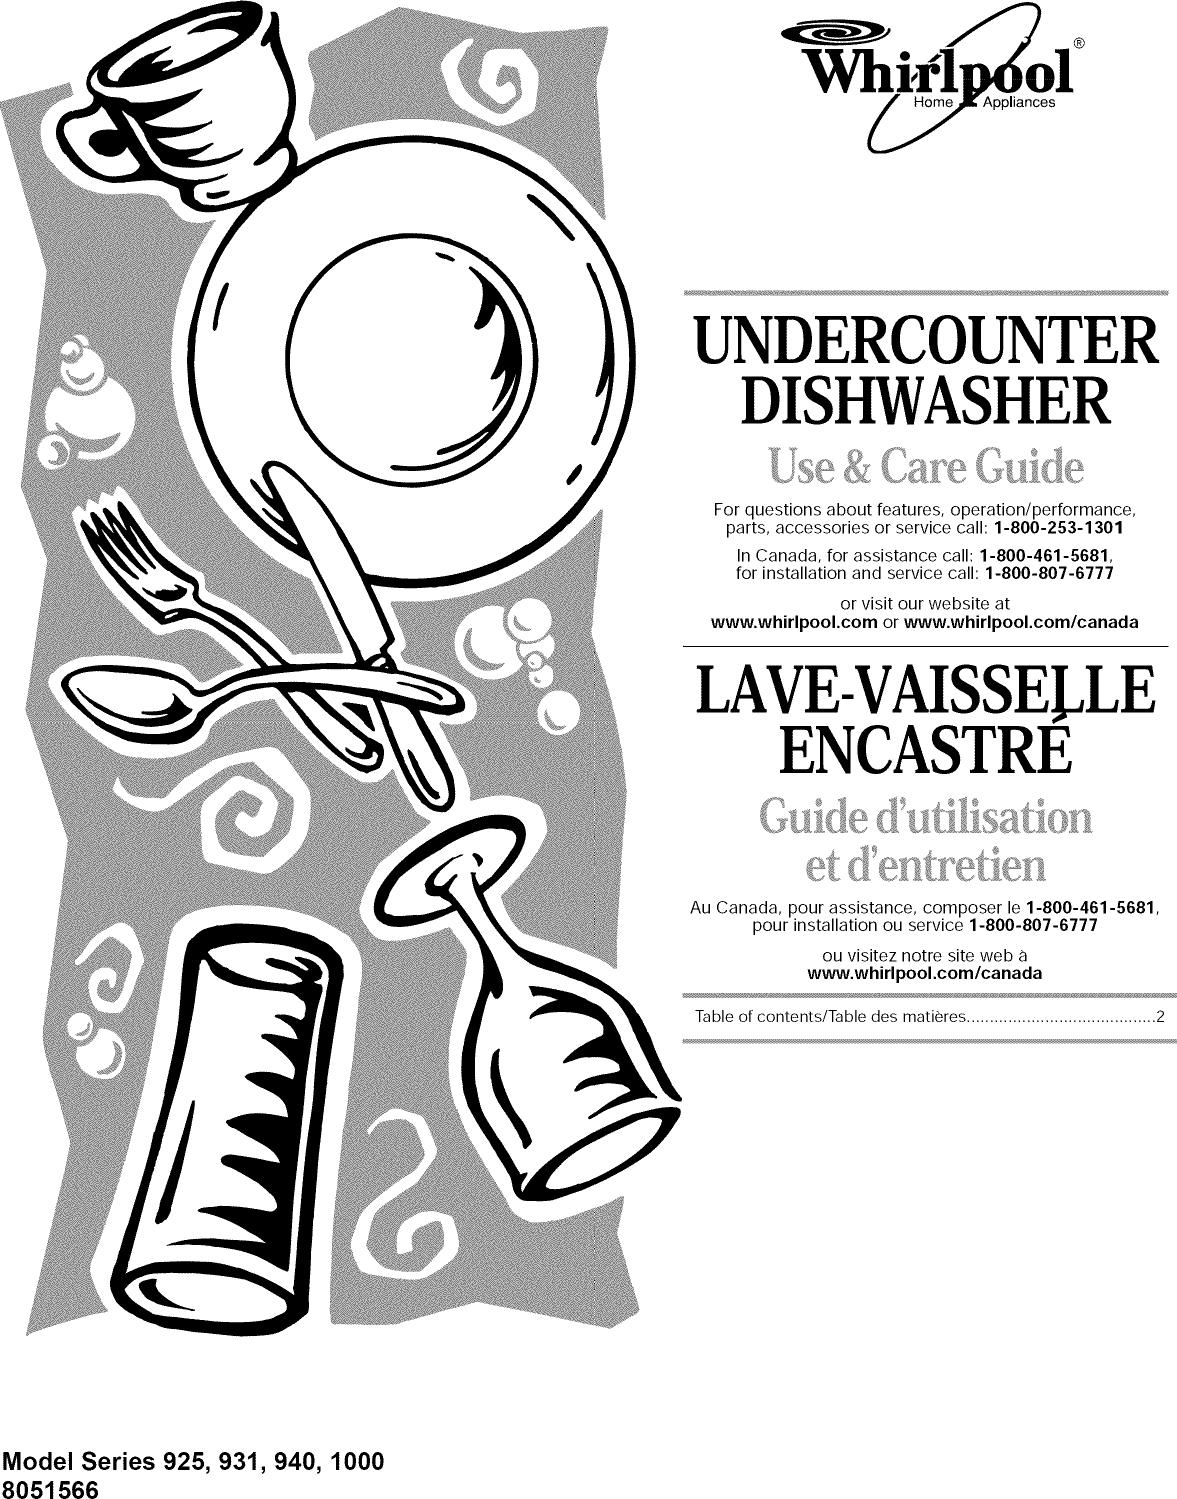 Whirlpool GU940SCGB2 User Manual UNDERCOUNTER DISHWASHER